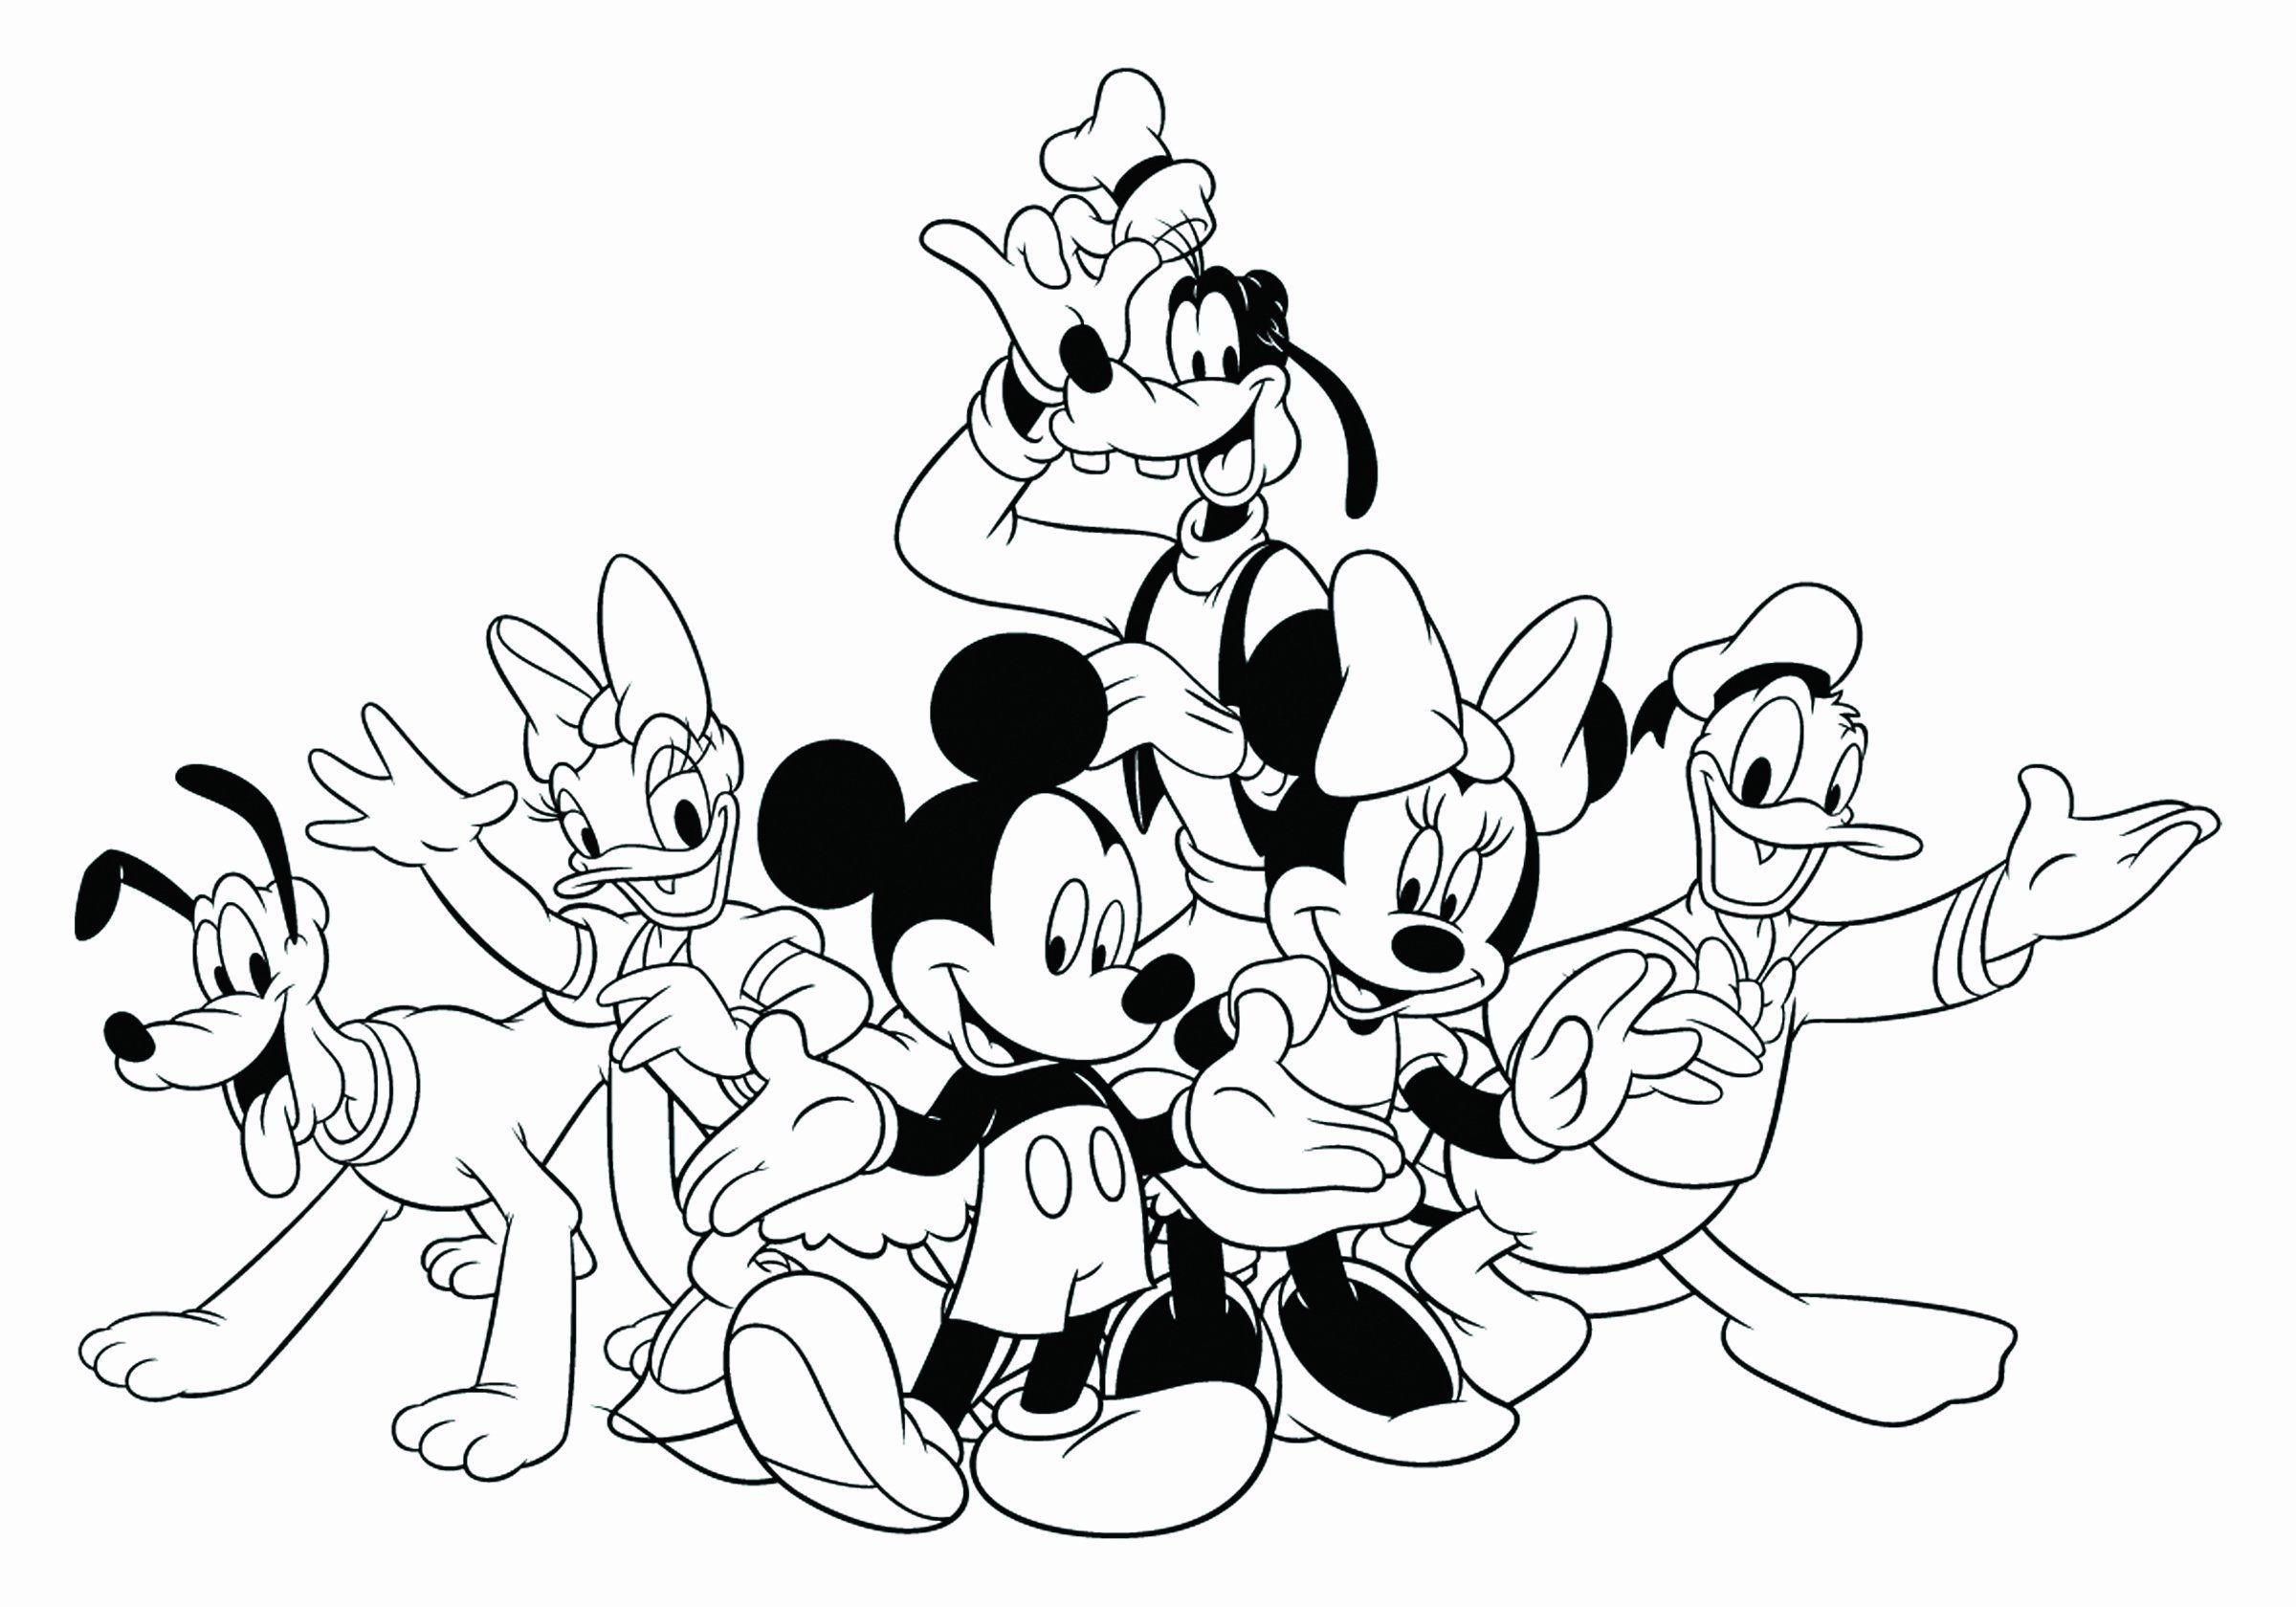 Disney Mickey Coloring Pages Elegant Disney Mickey S Typing Adventure Coloring Page Disney